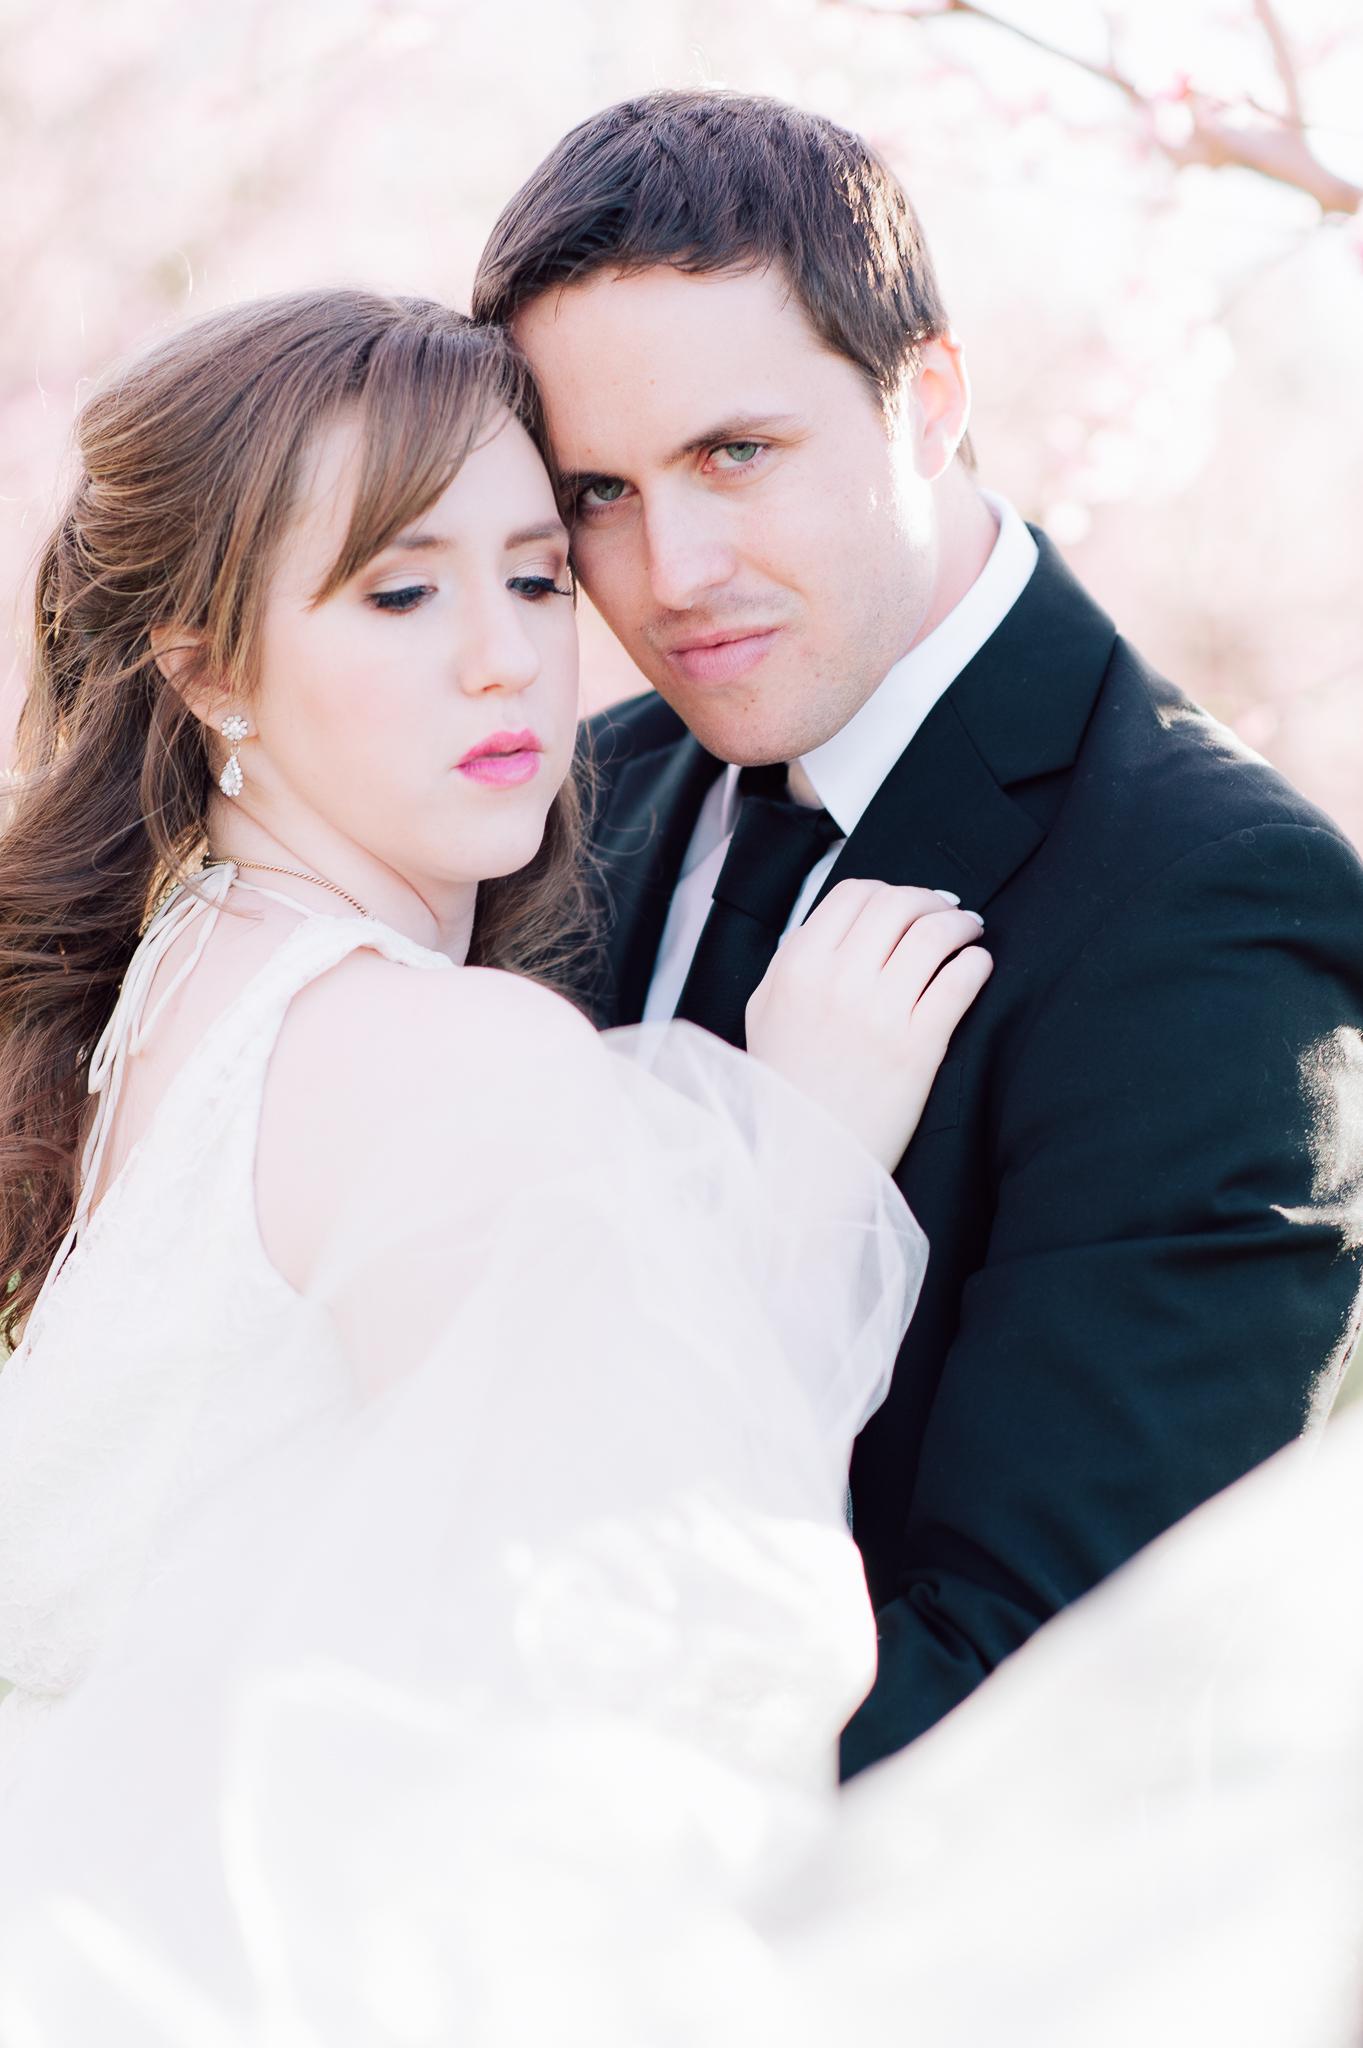 springwedding_cherryblossoms_virginiaphotographer_youseephotography_styledshoot (537).jpg